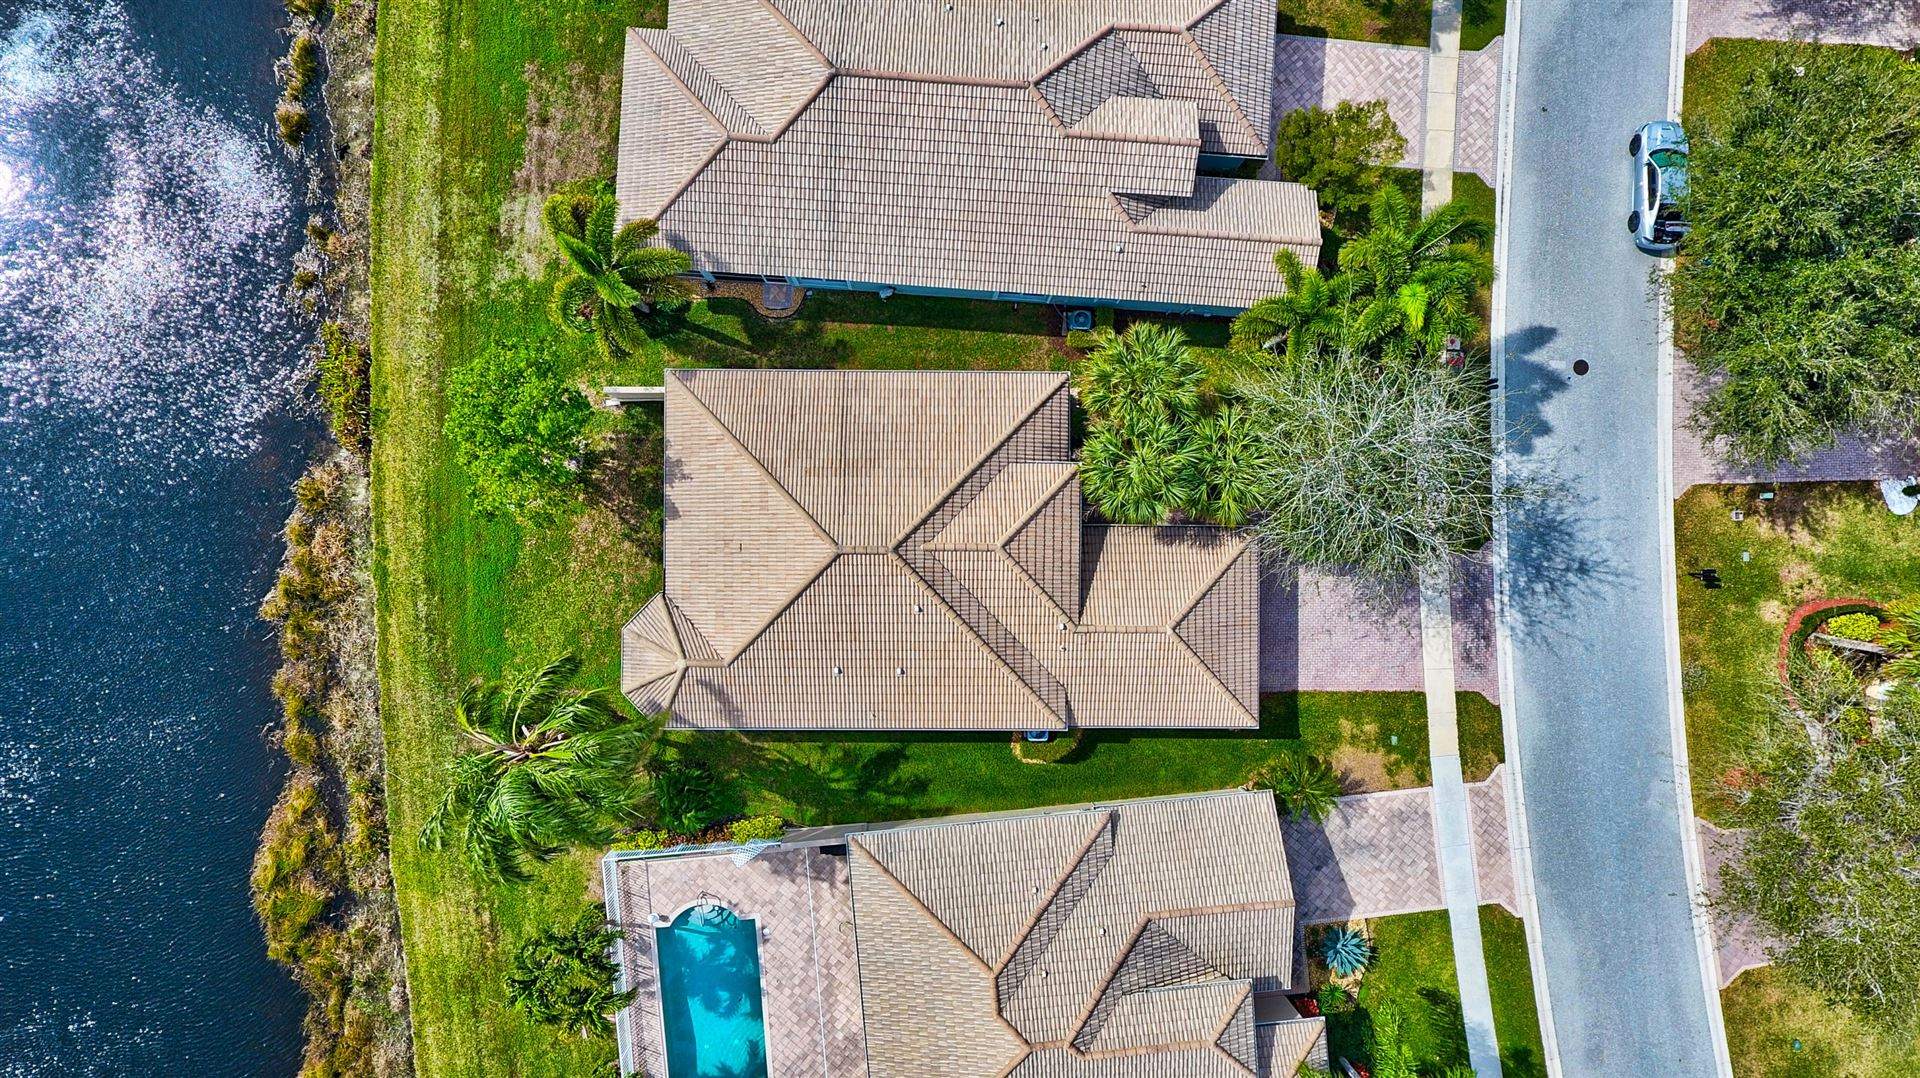 10896 Deer Park Lane, Boynton Beach, FL 33437 - #: RX-10690906